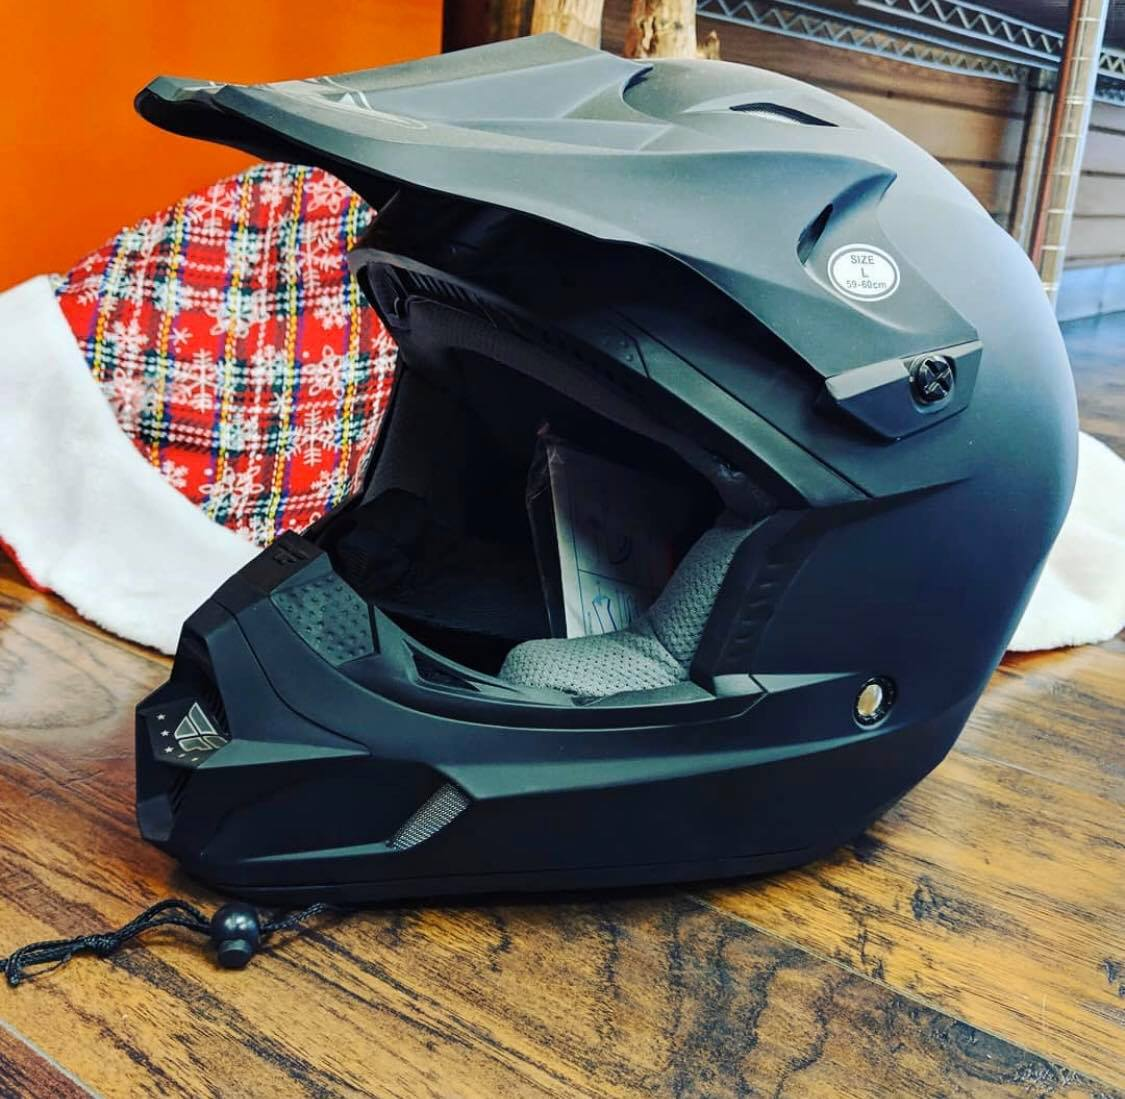 Best Dirt Bike Helmet Brands